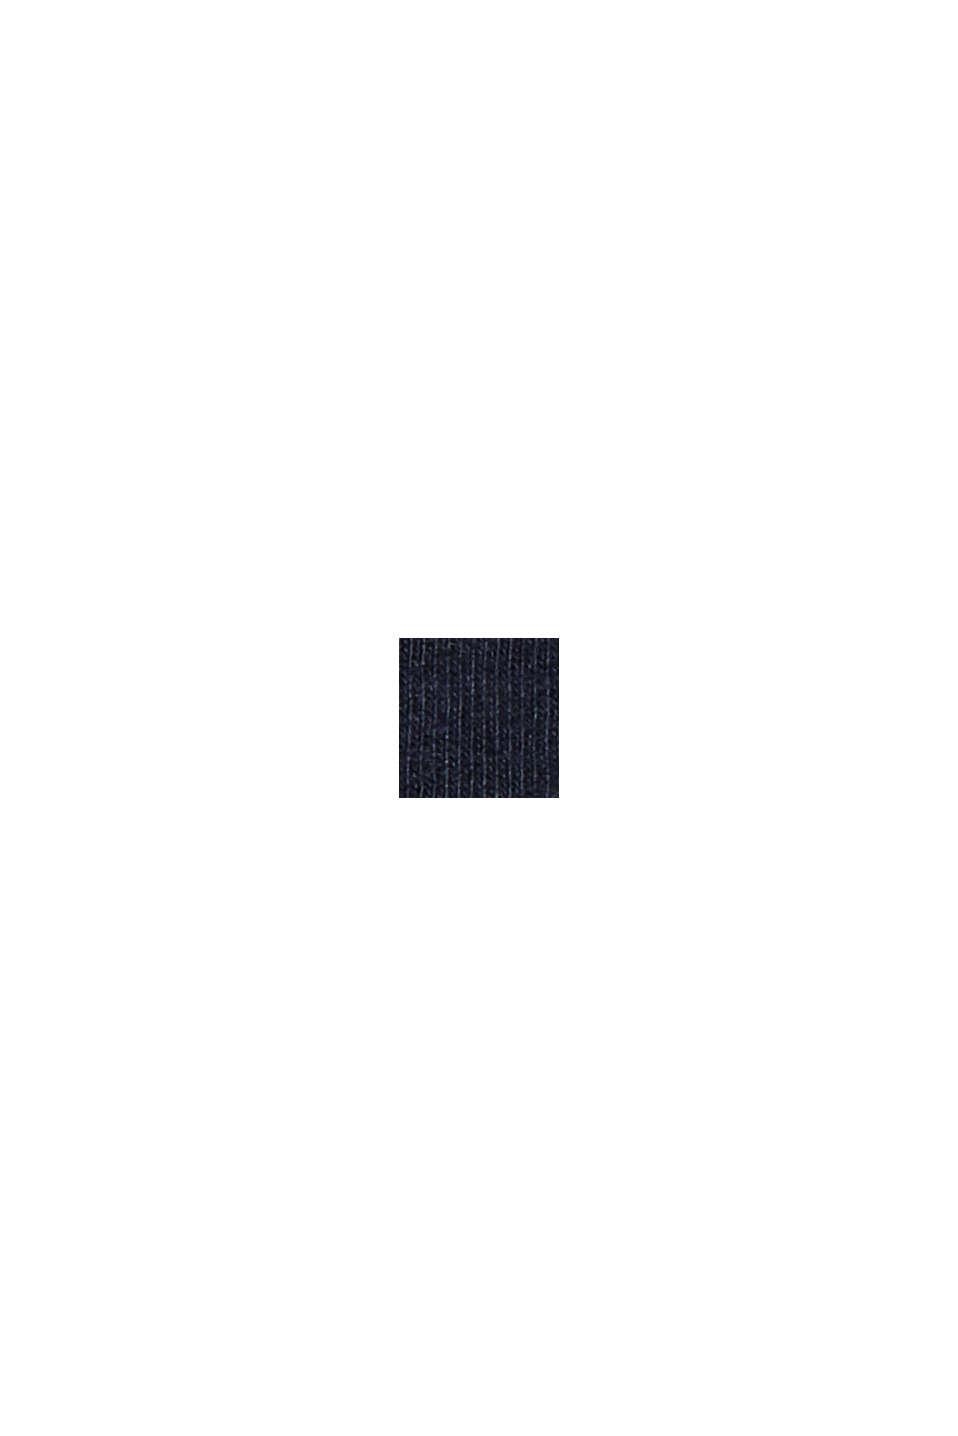 Maglia da pigiama vellutata, 100% cotone biologico, NAVY, swatch